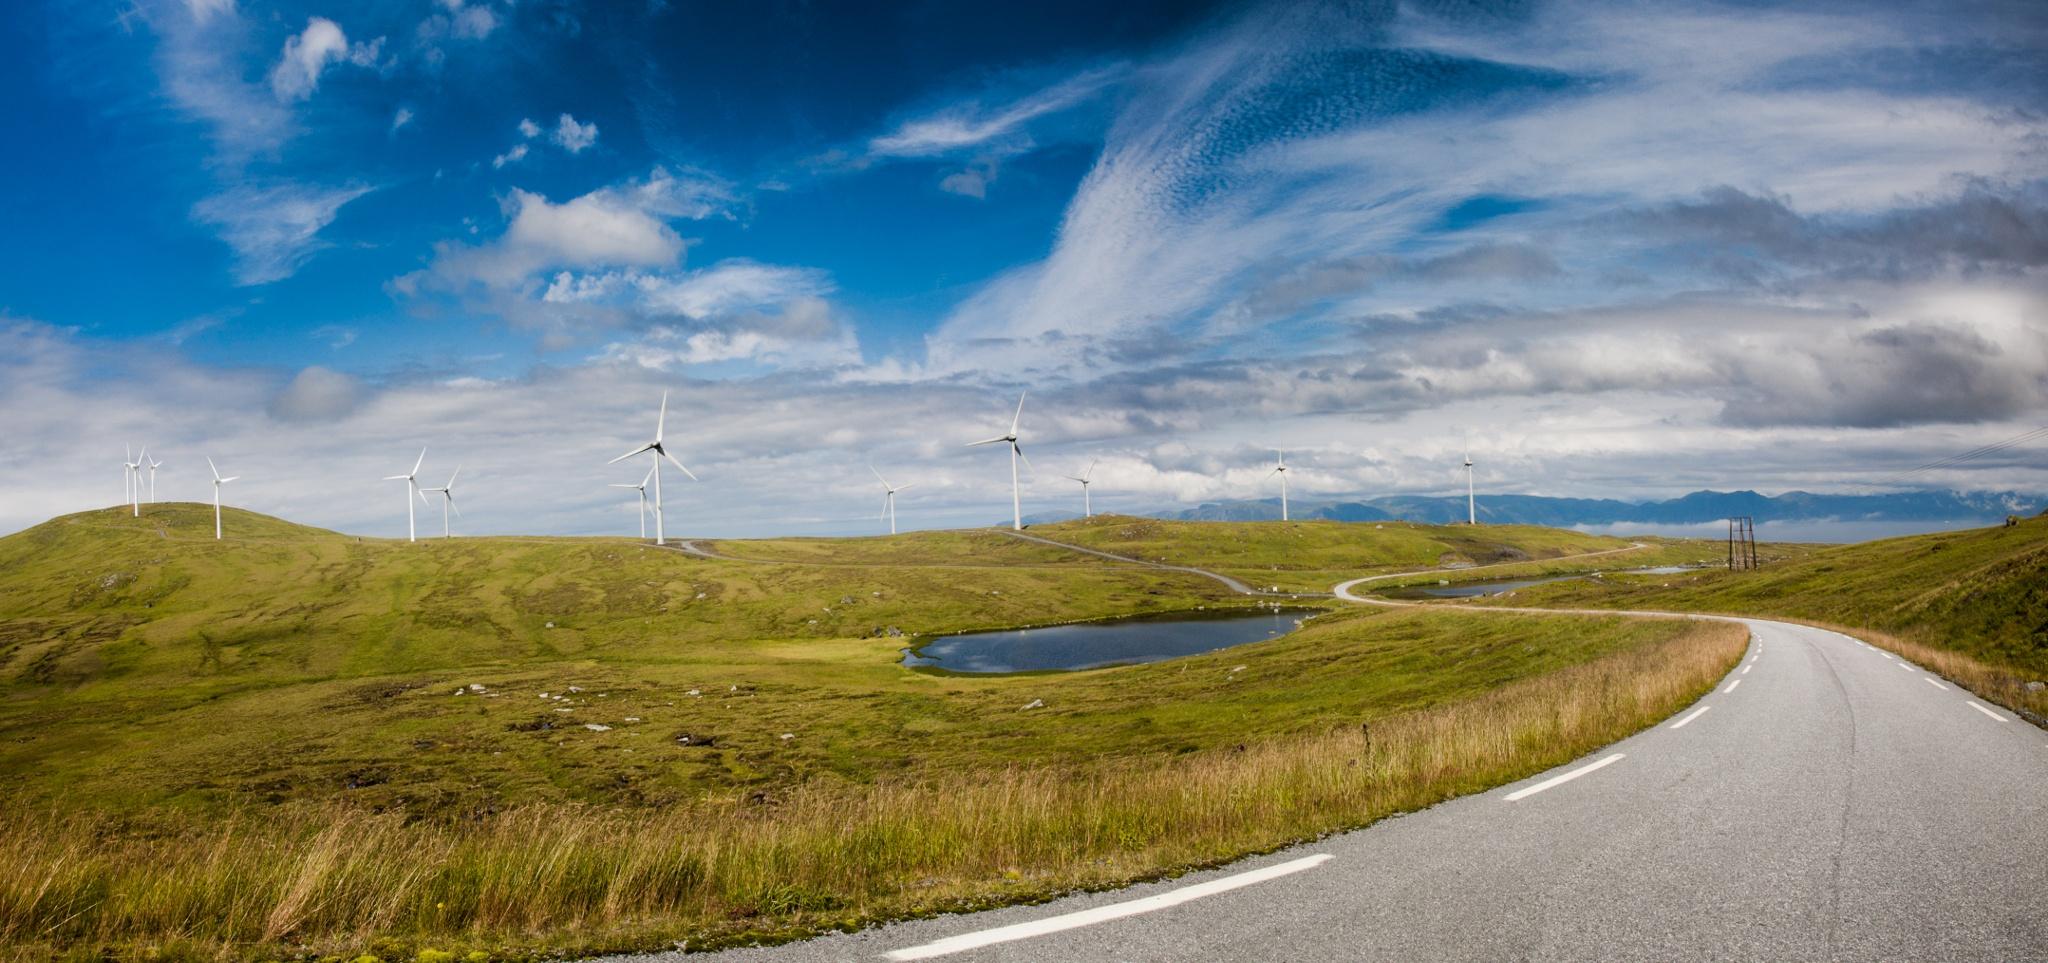 94791921-modern-windmills-at-the-edge-of-world